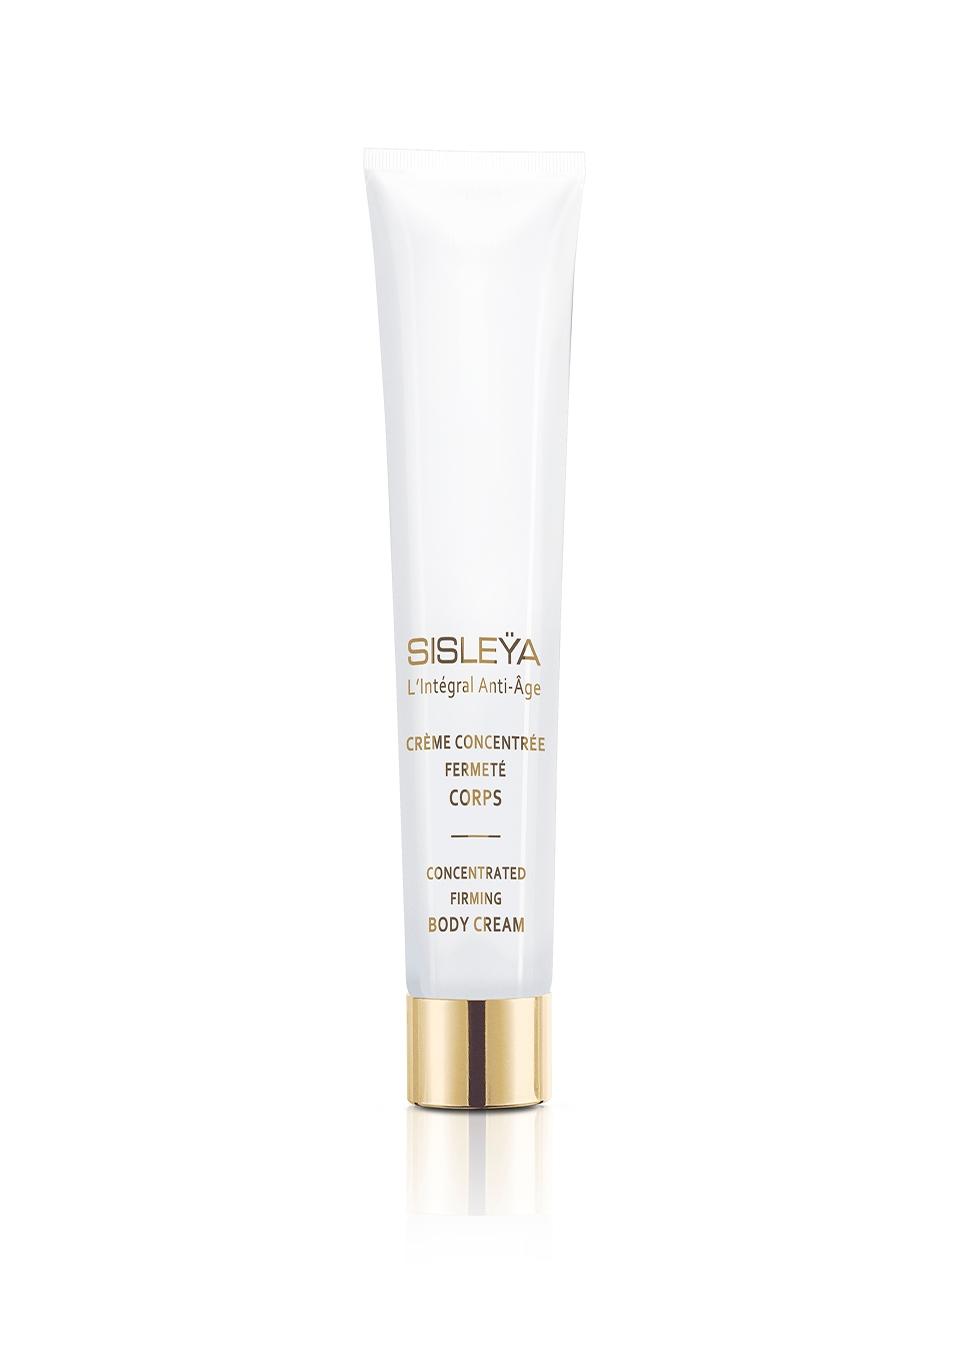 Sisleÿa L'Intégral Anti- ge Concentrated Firming Body Cream 150ml